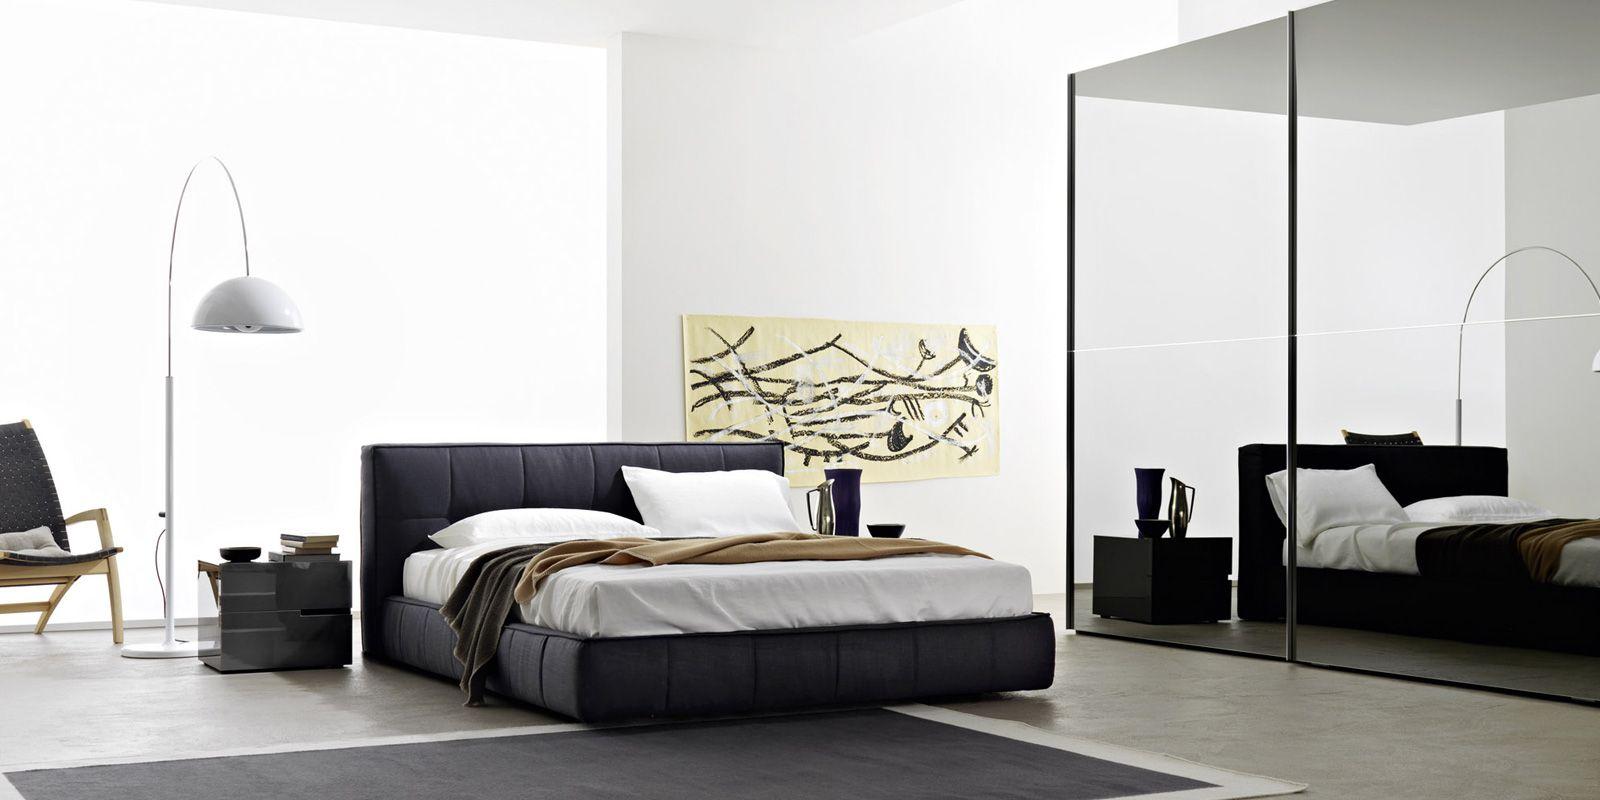 Camere da letto mobilificio san giacomo letto supersoft - San giacomo camere da letto ...